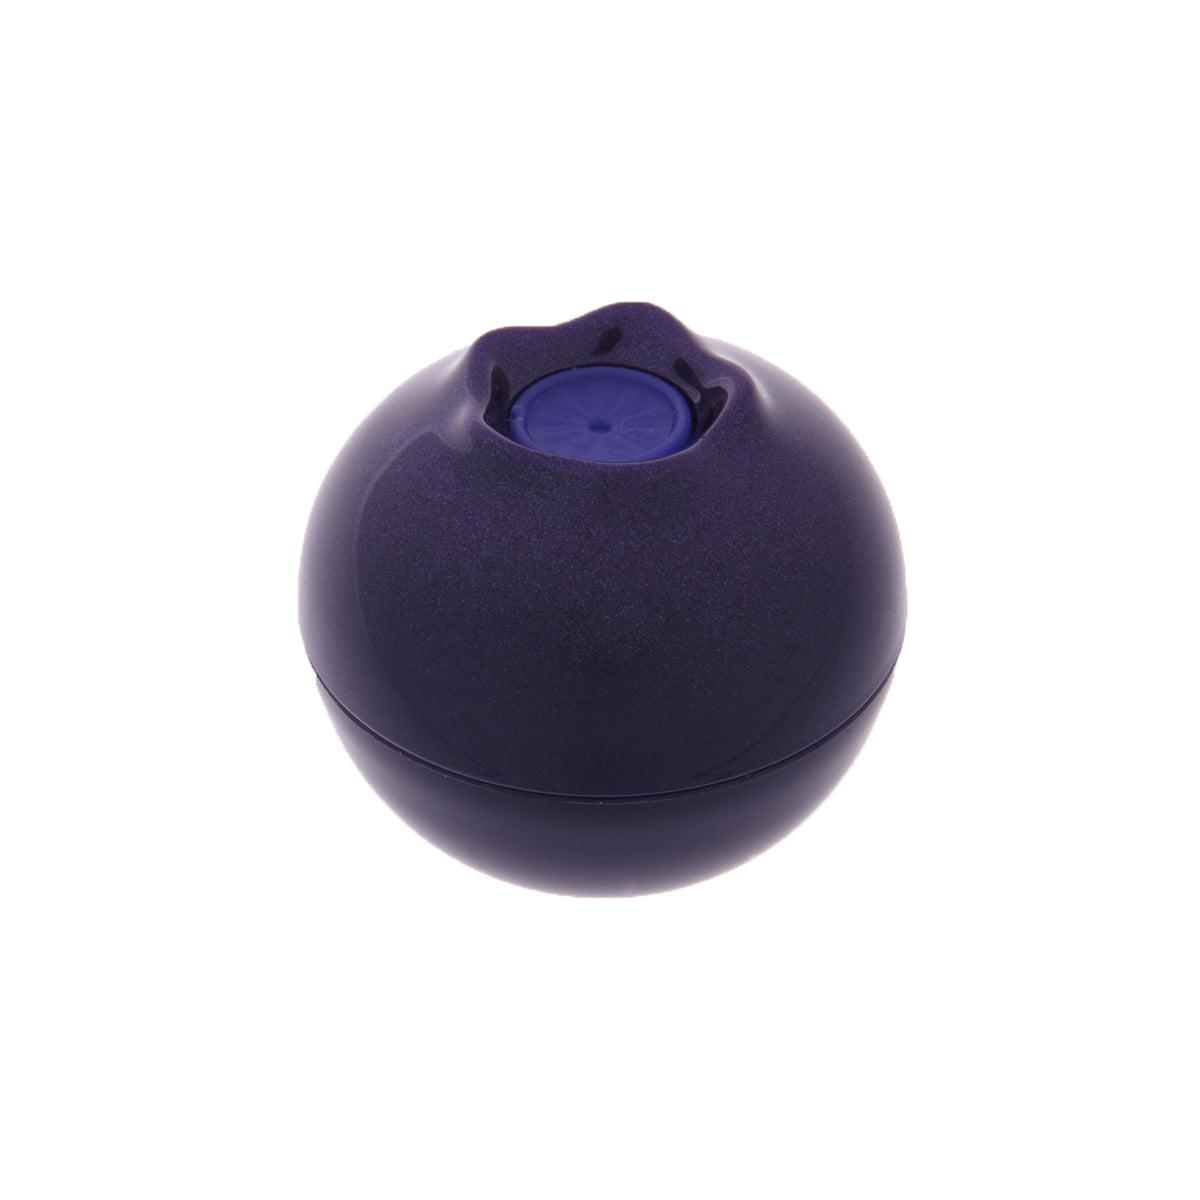 tonymoly.us - Mini Fruit Lip Balm